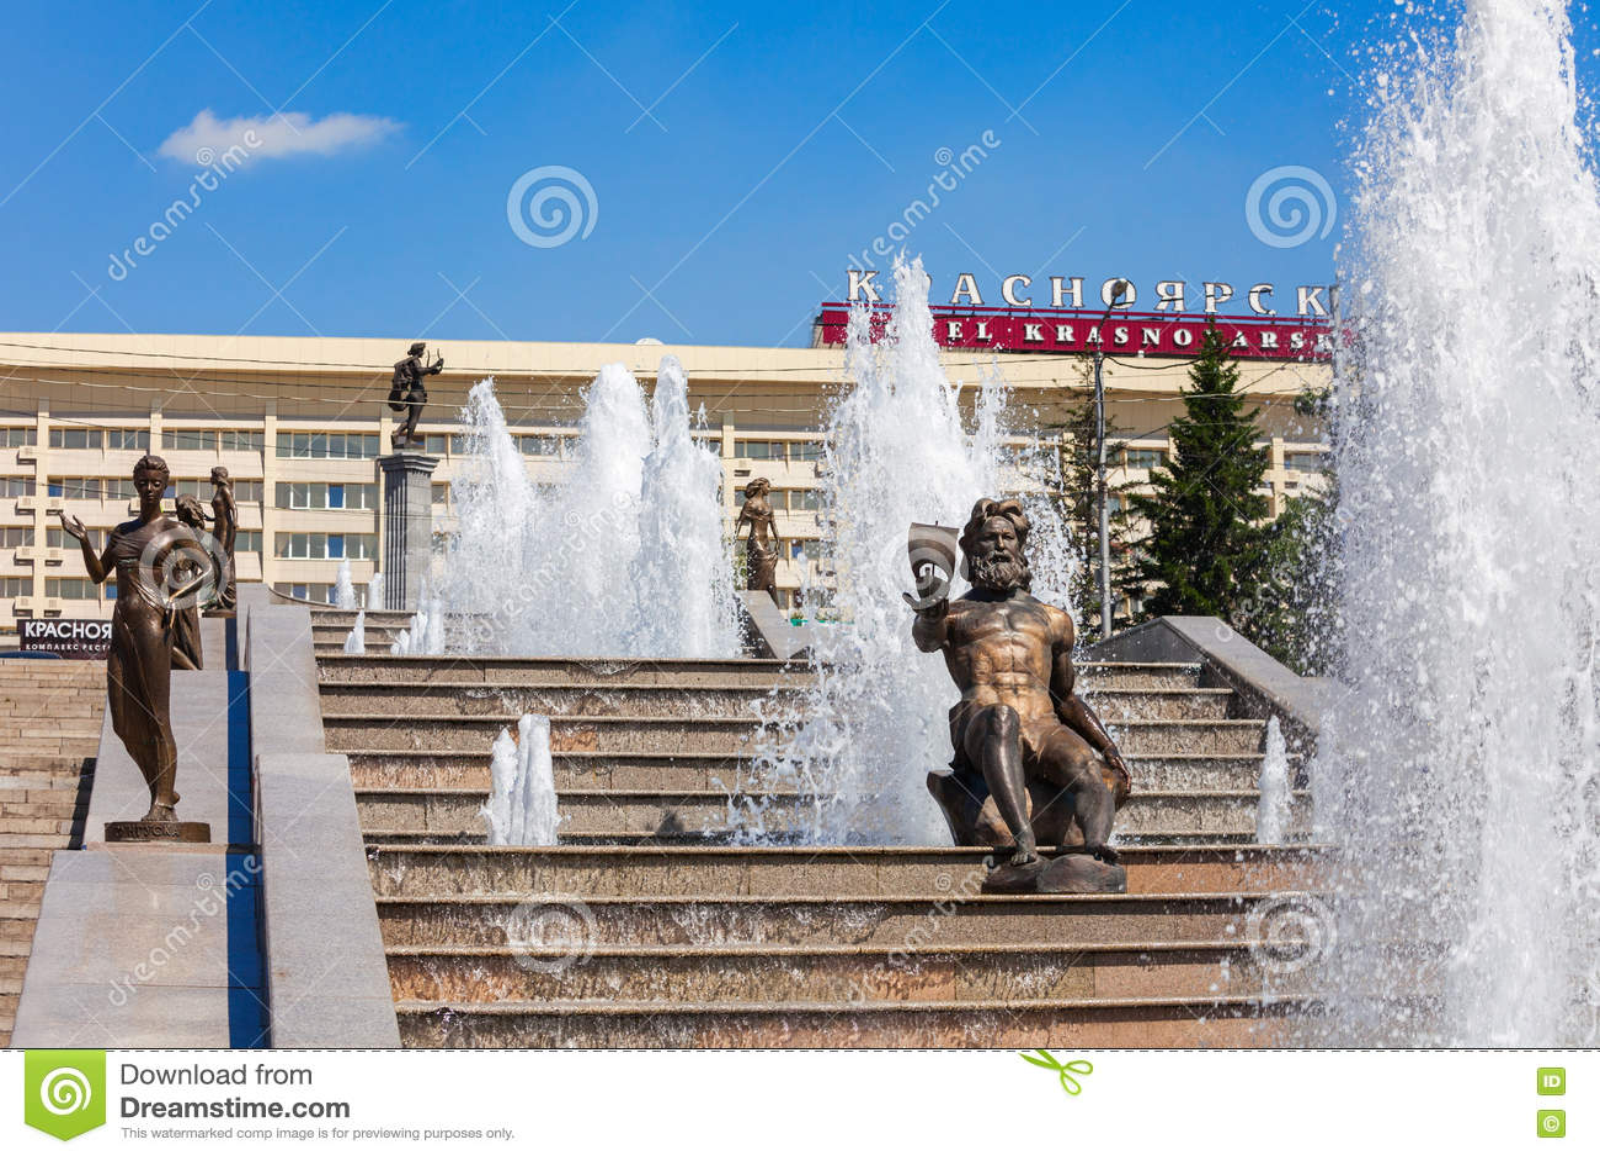 Krasnoyarsk Hotel In Krasnoyarsk Editorial Photo Image Of